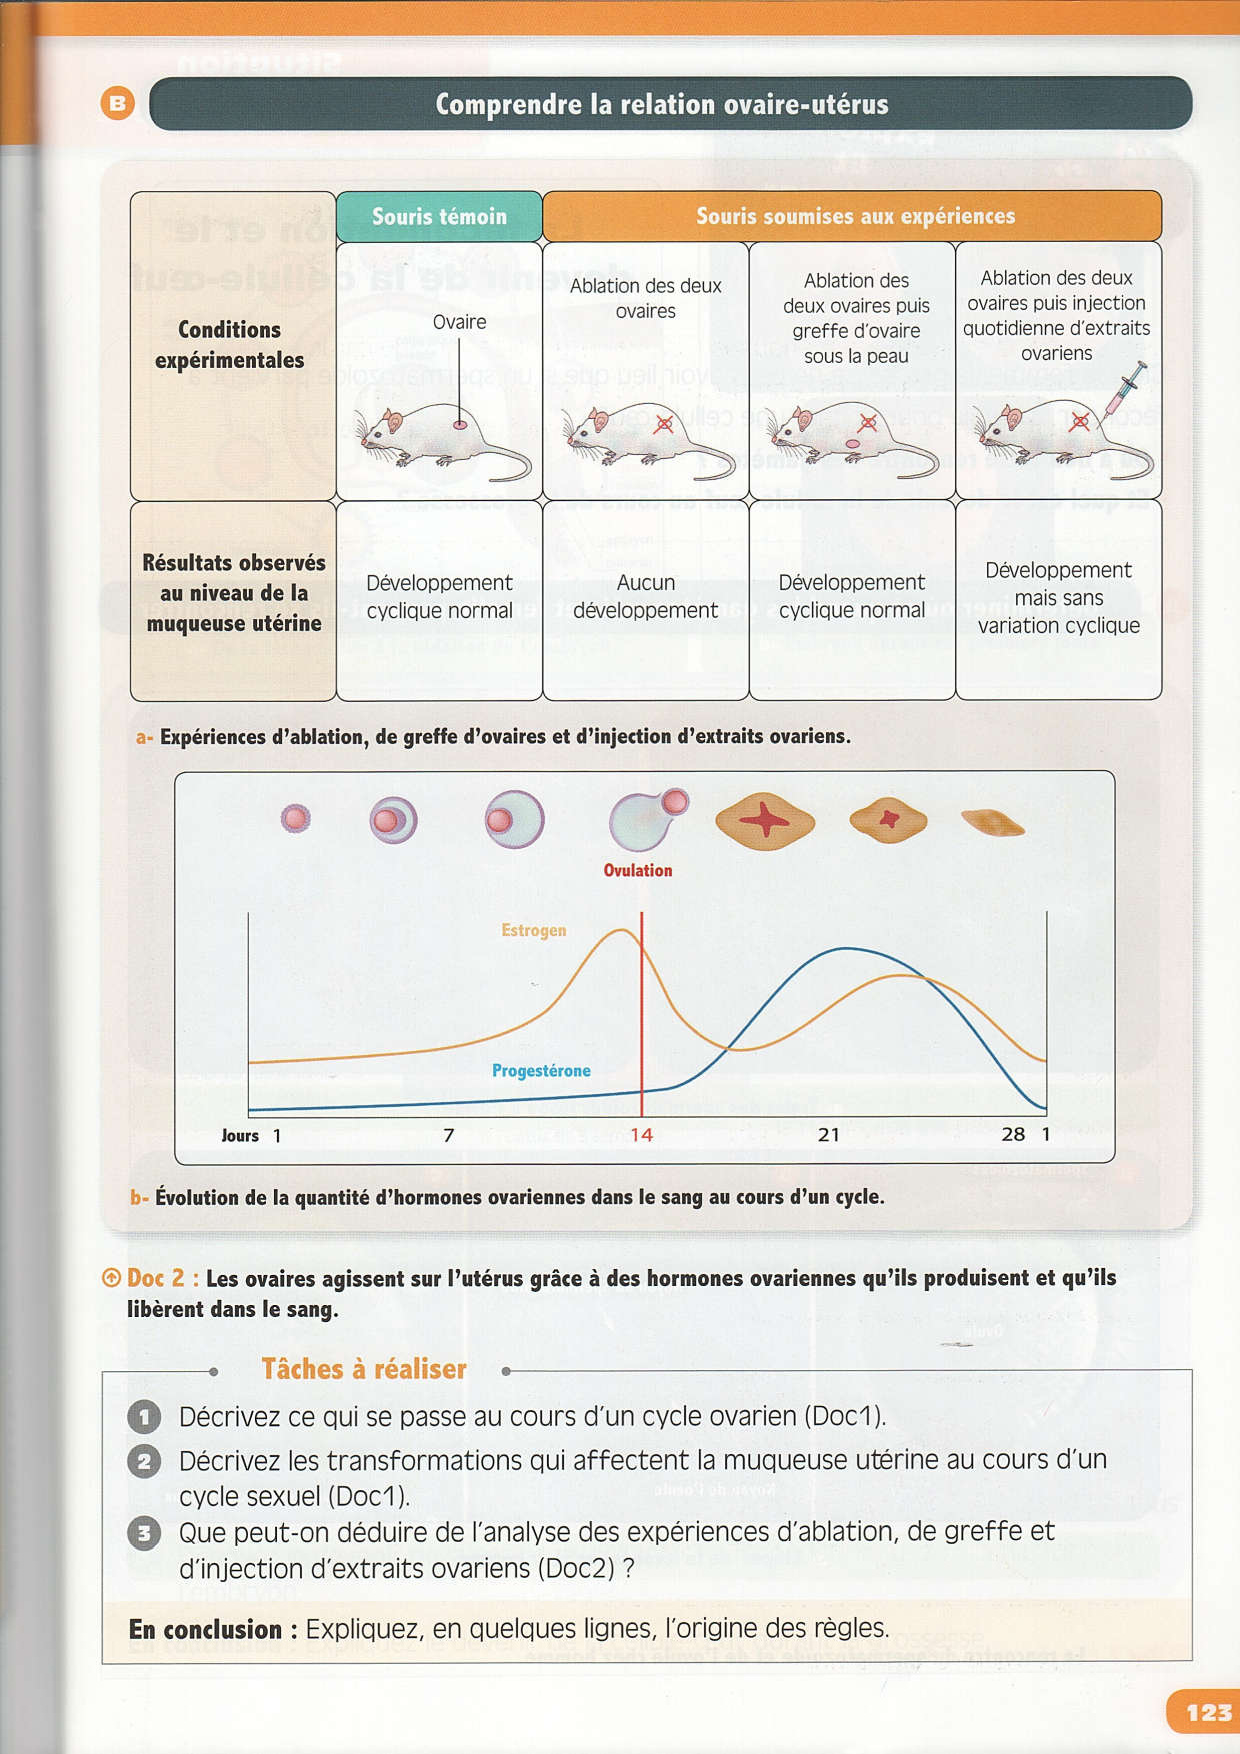 What Is Svt >> La reproduction humaine - Cours (Manuel) - AlloSchool